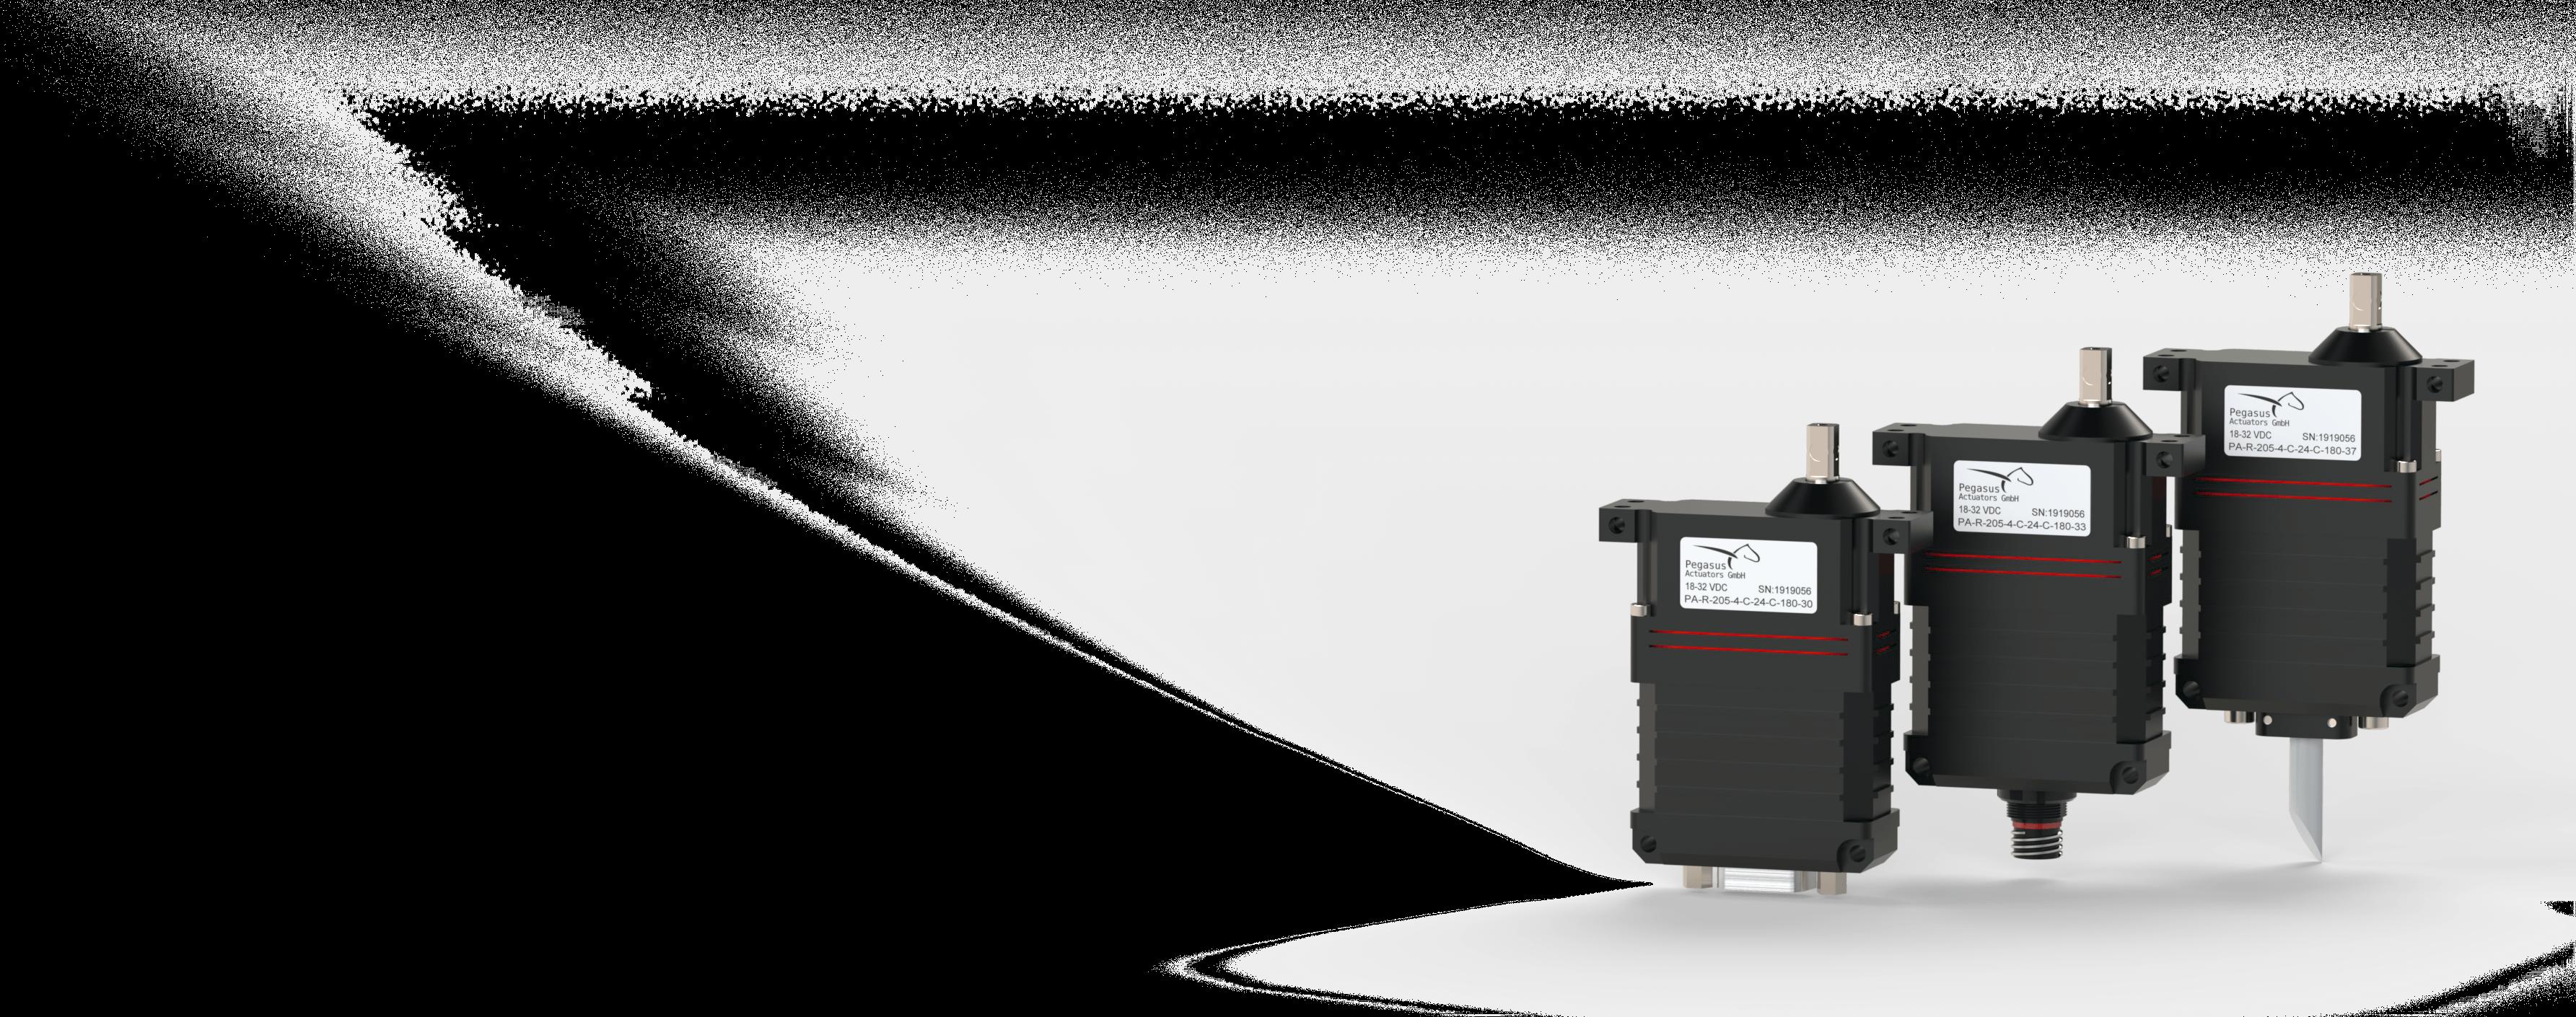 PA-R-205-4 Industrial Actuators